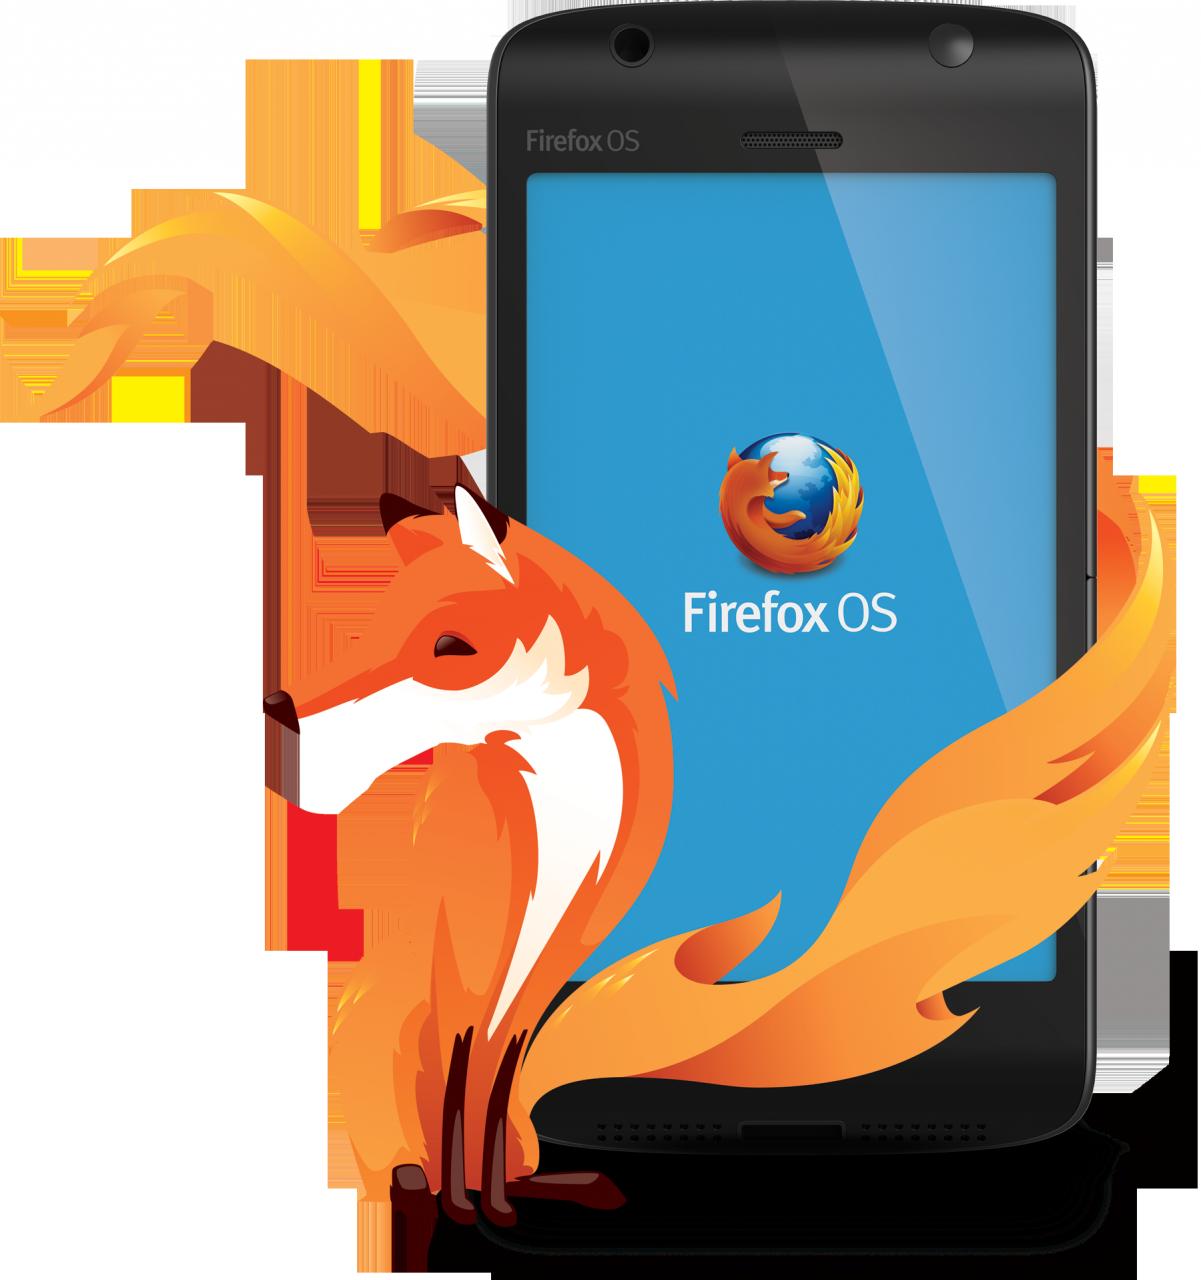 Sony Xperia SP riceve un porting funzionante di Firefox OS